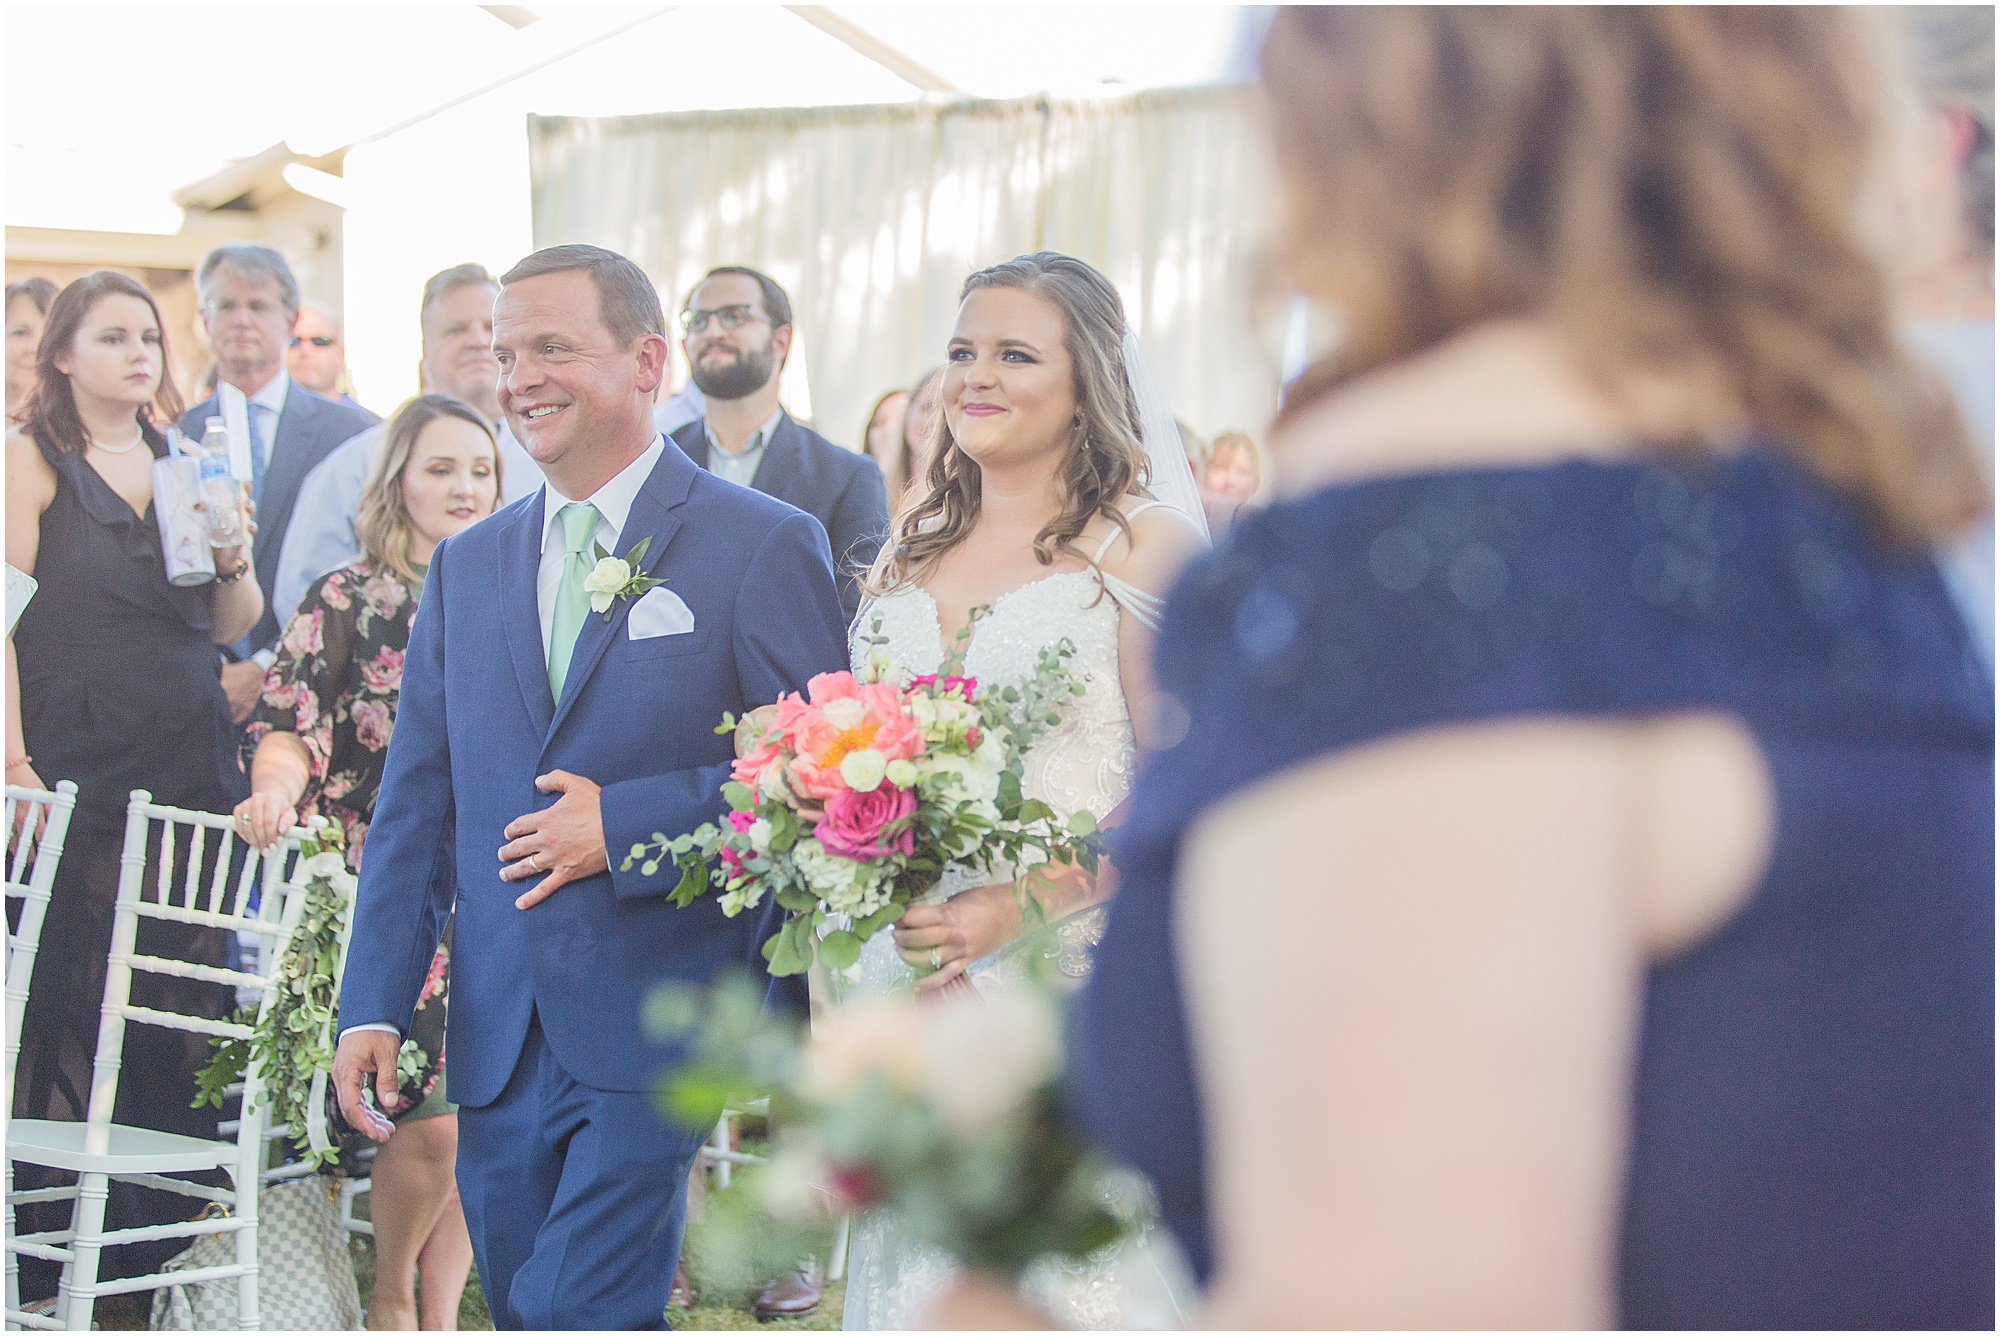 starkville-mississippi-wedding-page-place-dodson-farms_0056.jpg